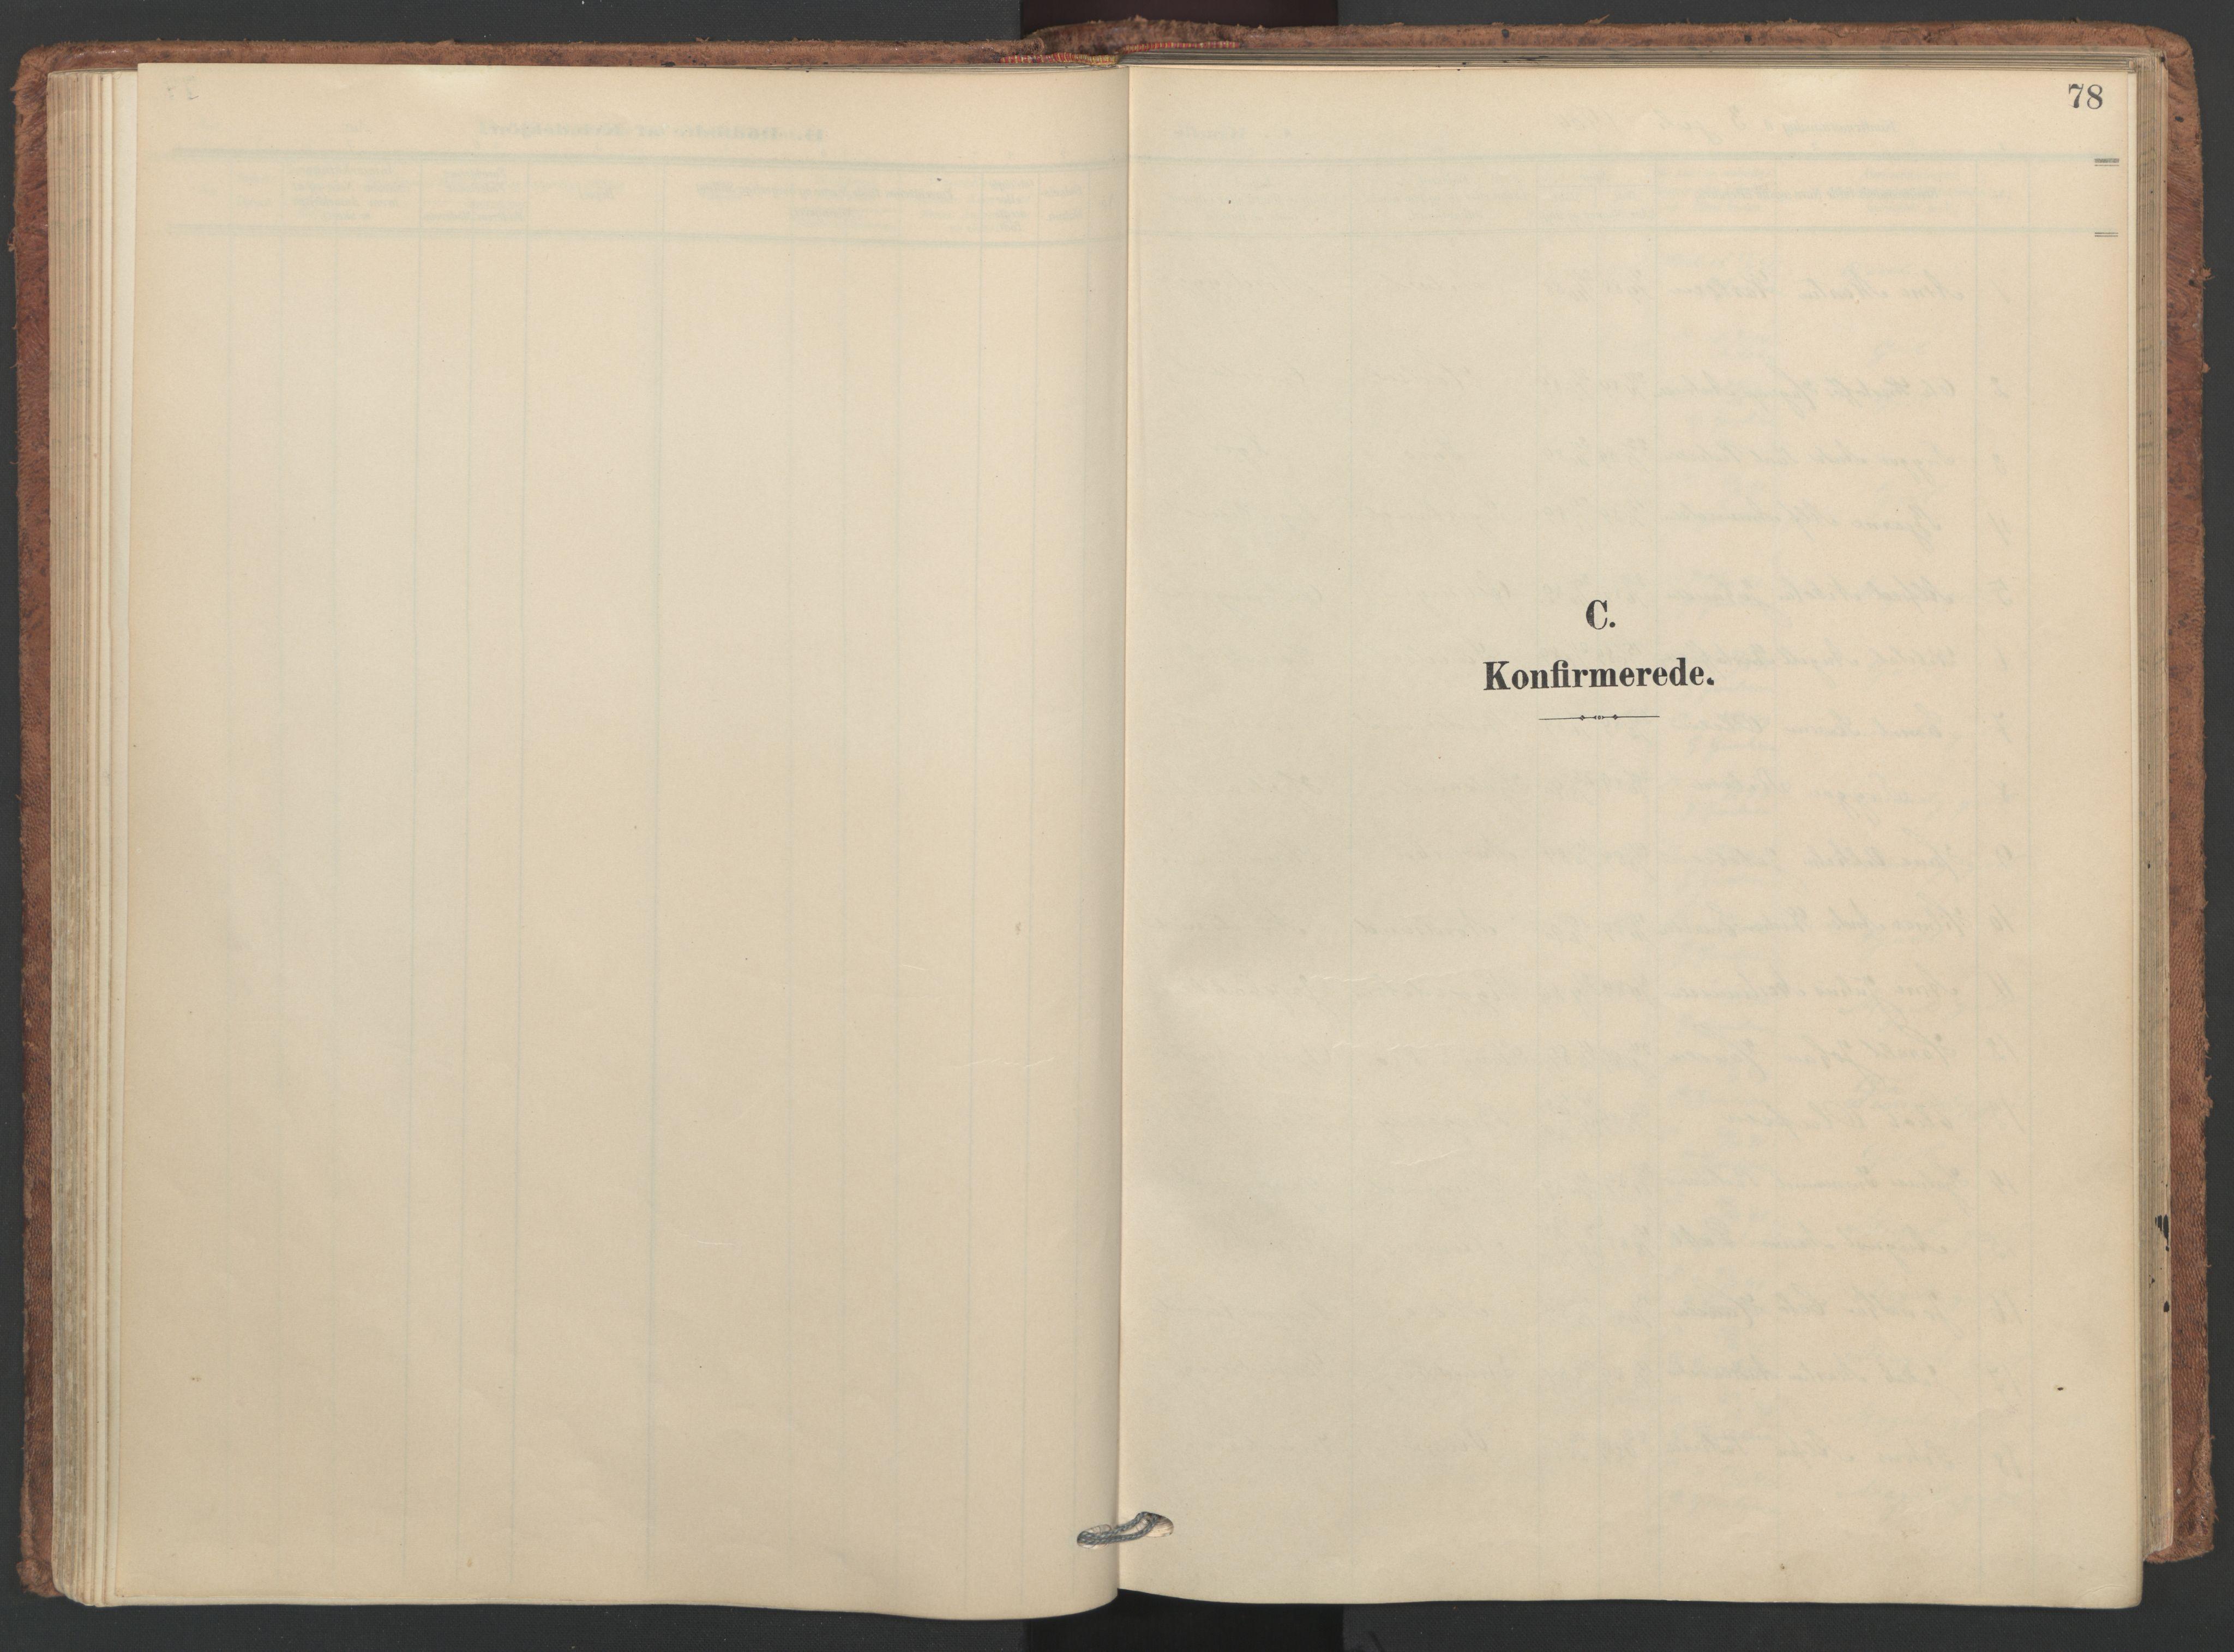 SAT, Ministerialprotokoller, klokkerbøker og fødselsregistre - Nordland, 893/L1339: Ministerialbok nr. 893A11, 1904-1914, s. 78